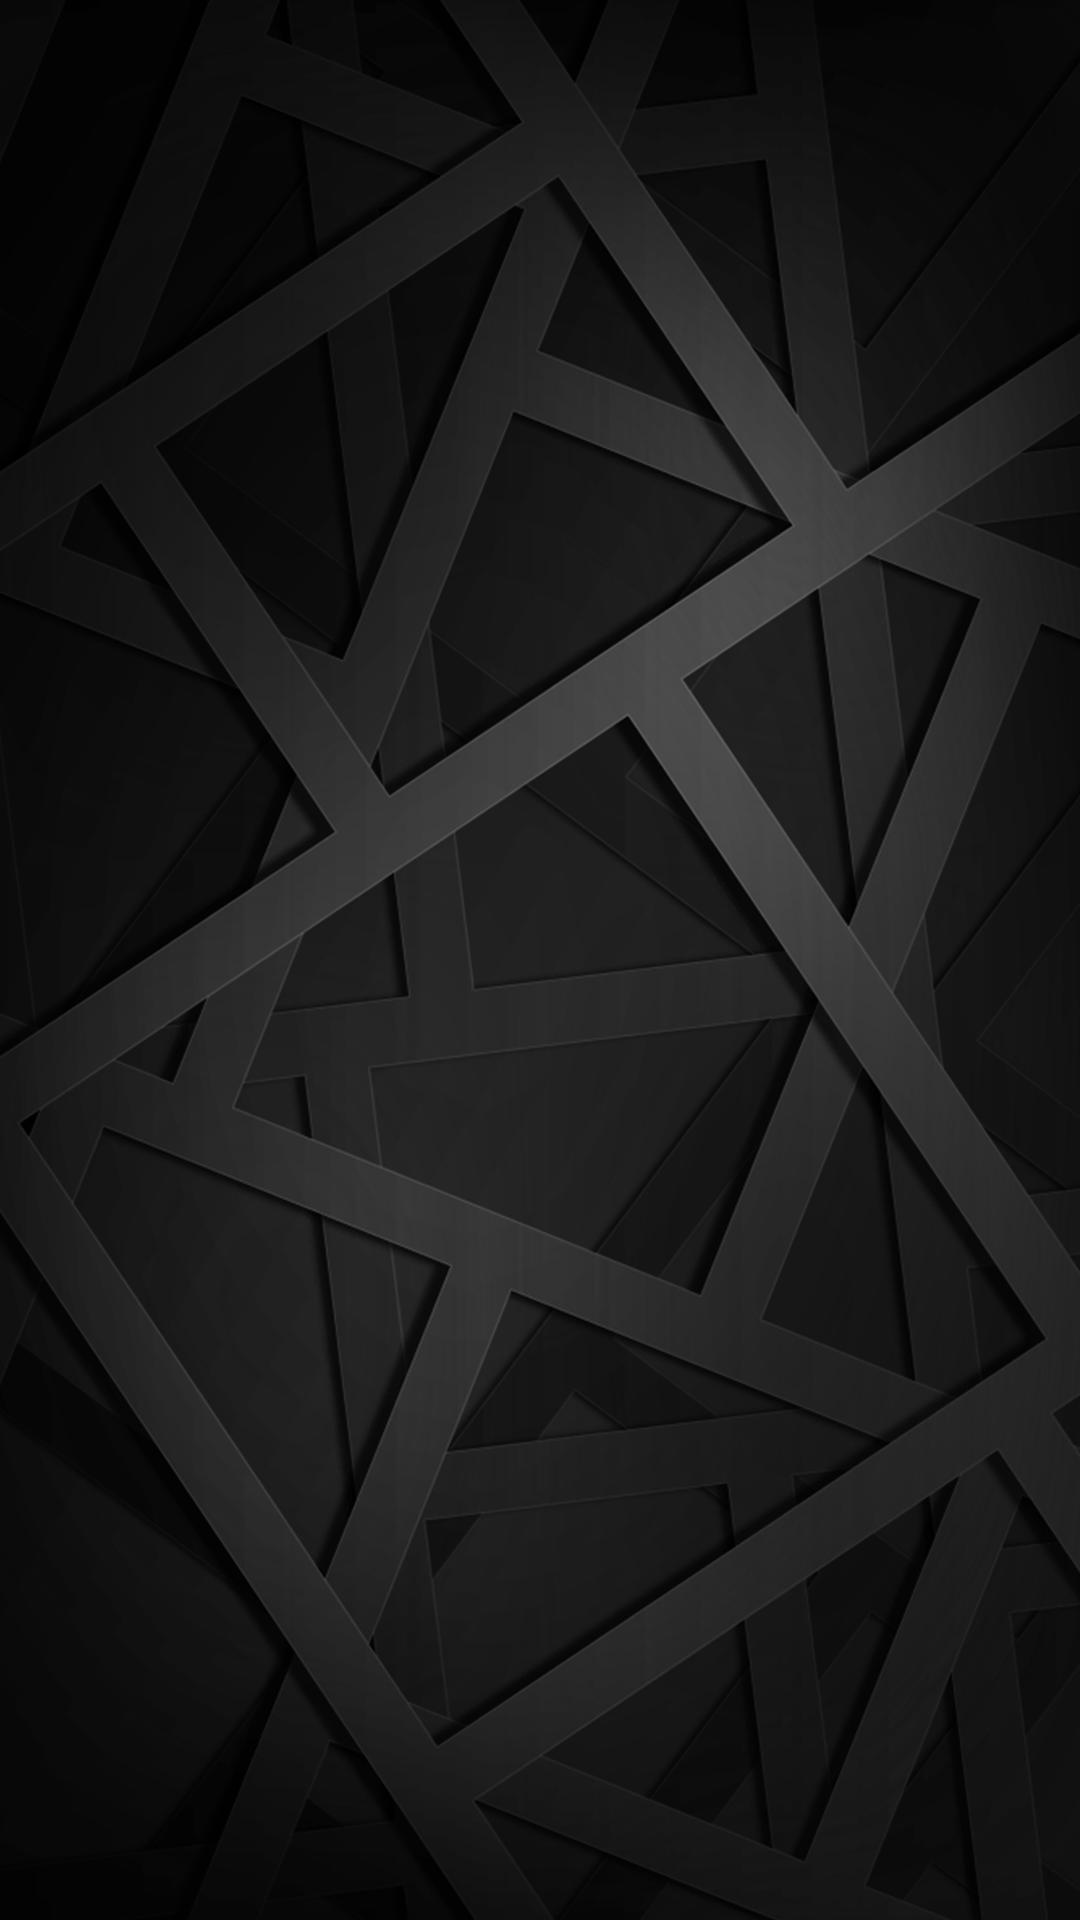 Android Dark 4k Wallpapers Wallpaper Cave